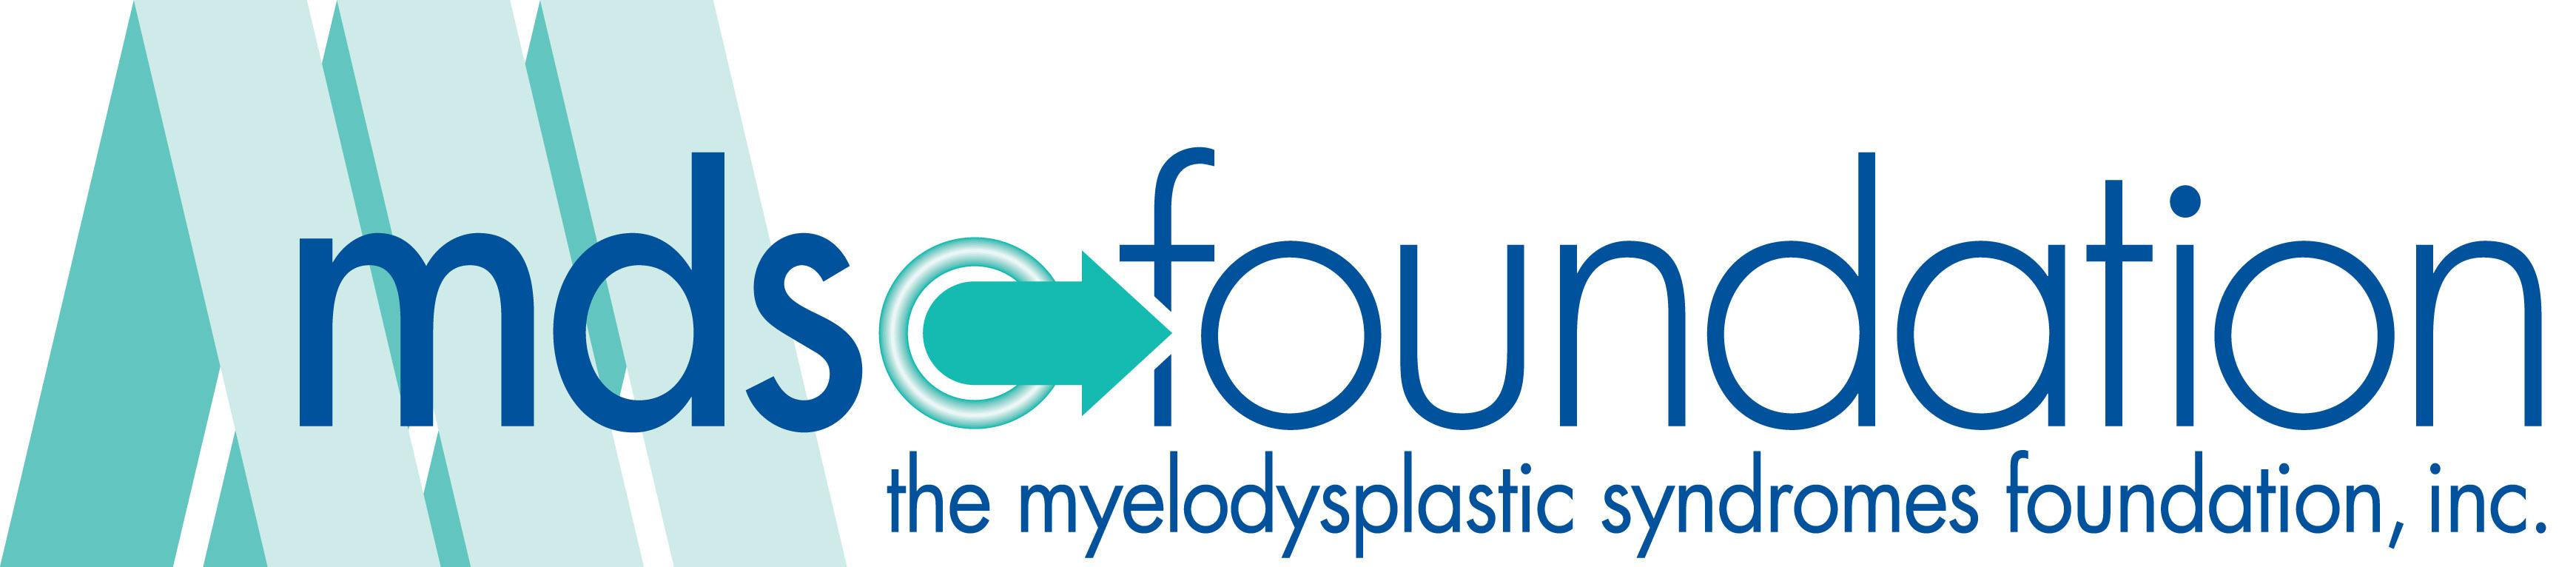 MDS Foundation Inc. Logo